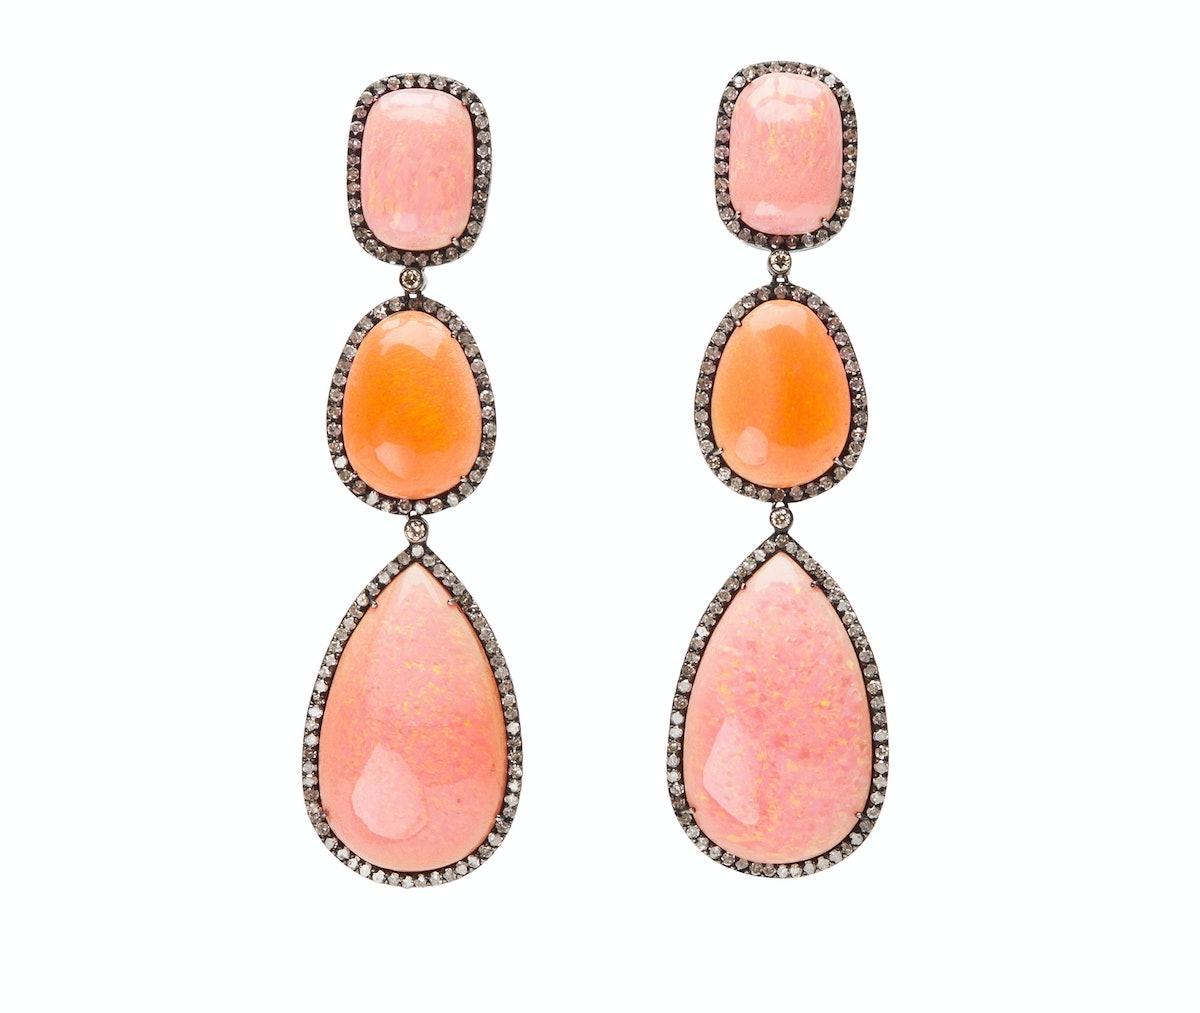 Lauren Craft 18k gold, peach opals, Ethiopian opal and champagne diamond drop earrings